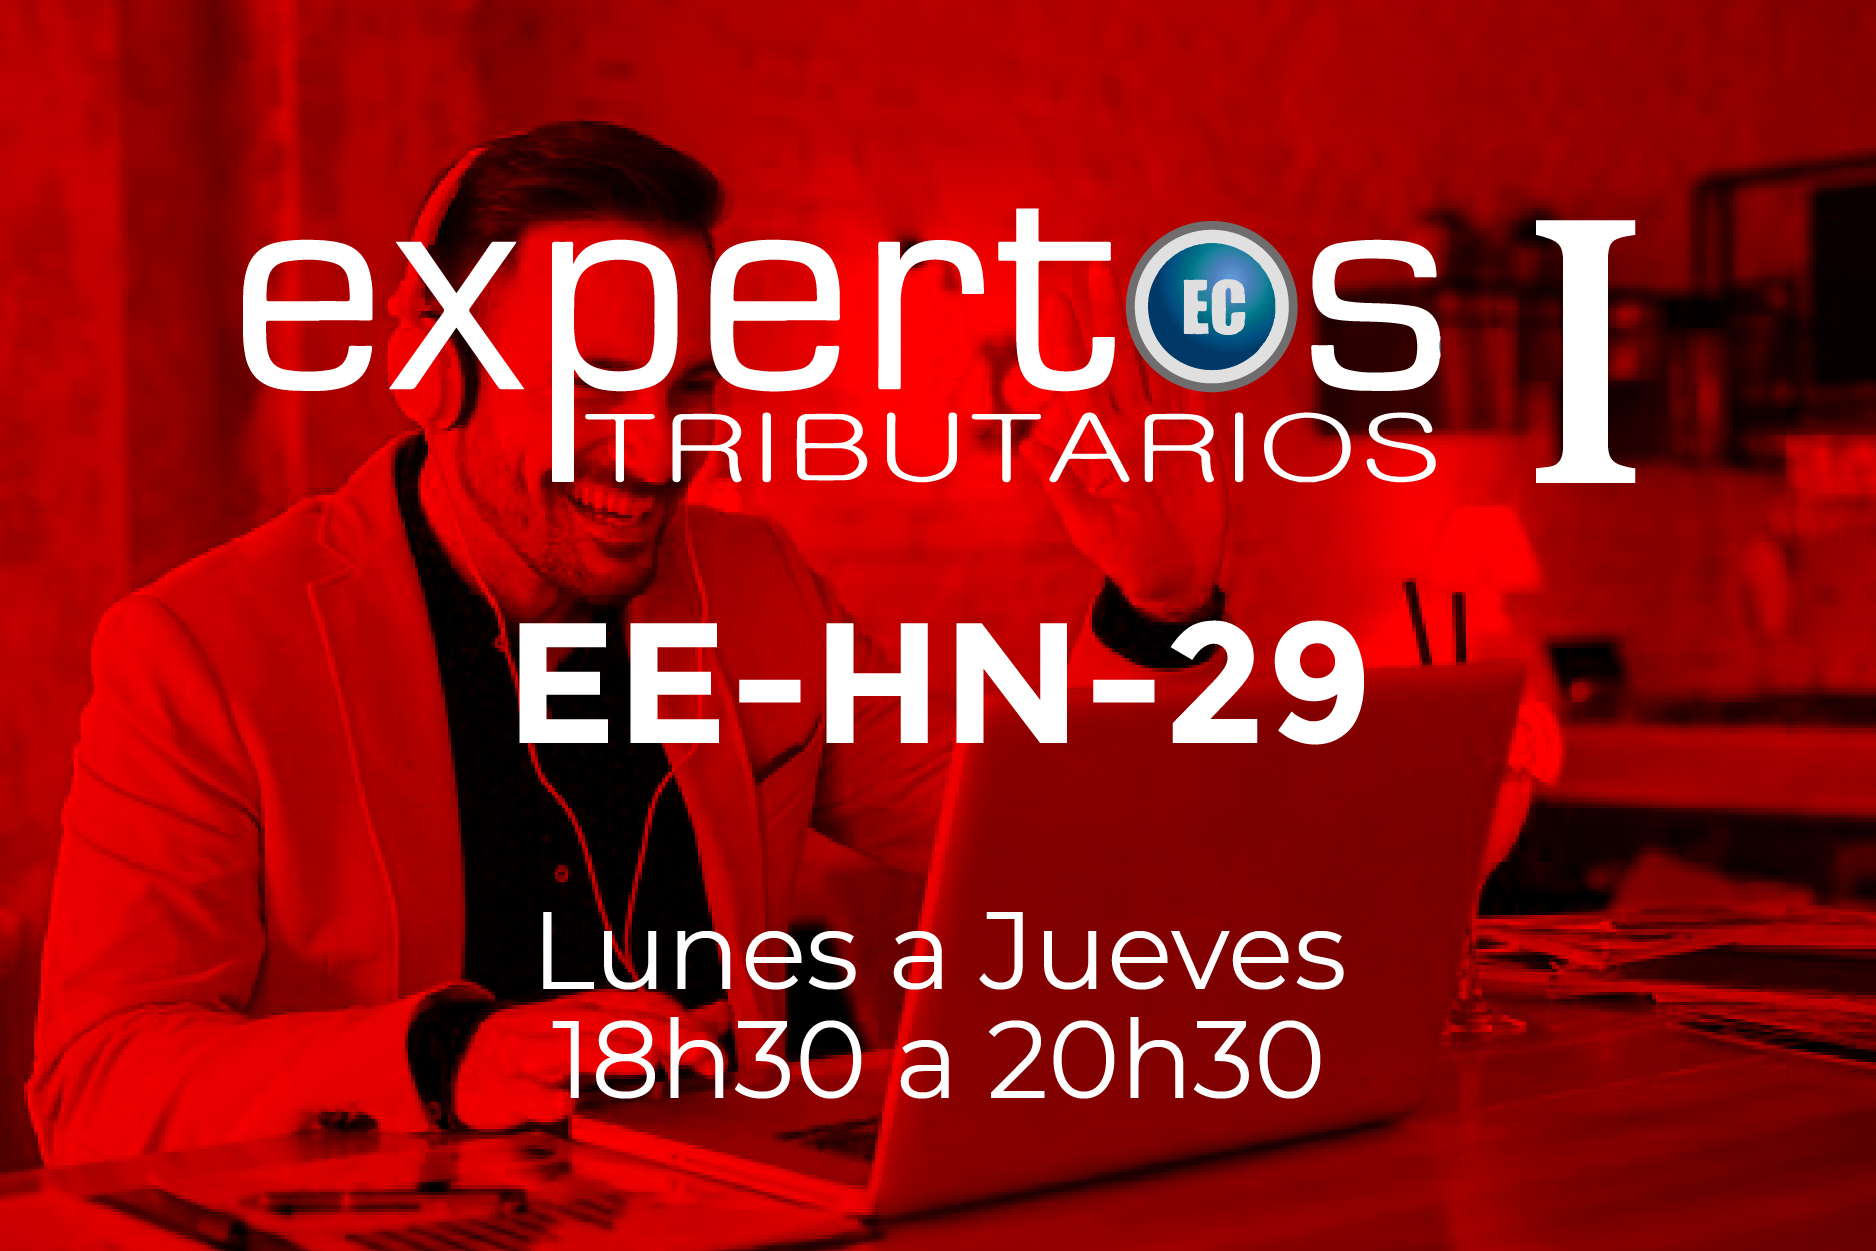 29 - EXPERTOS TRIBUTARIOS - LUNES A JUEVES - 18:00 A 20:30